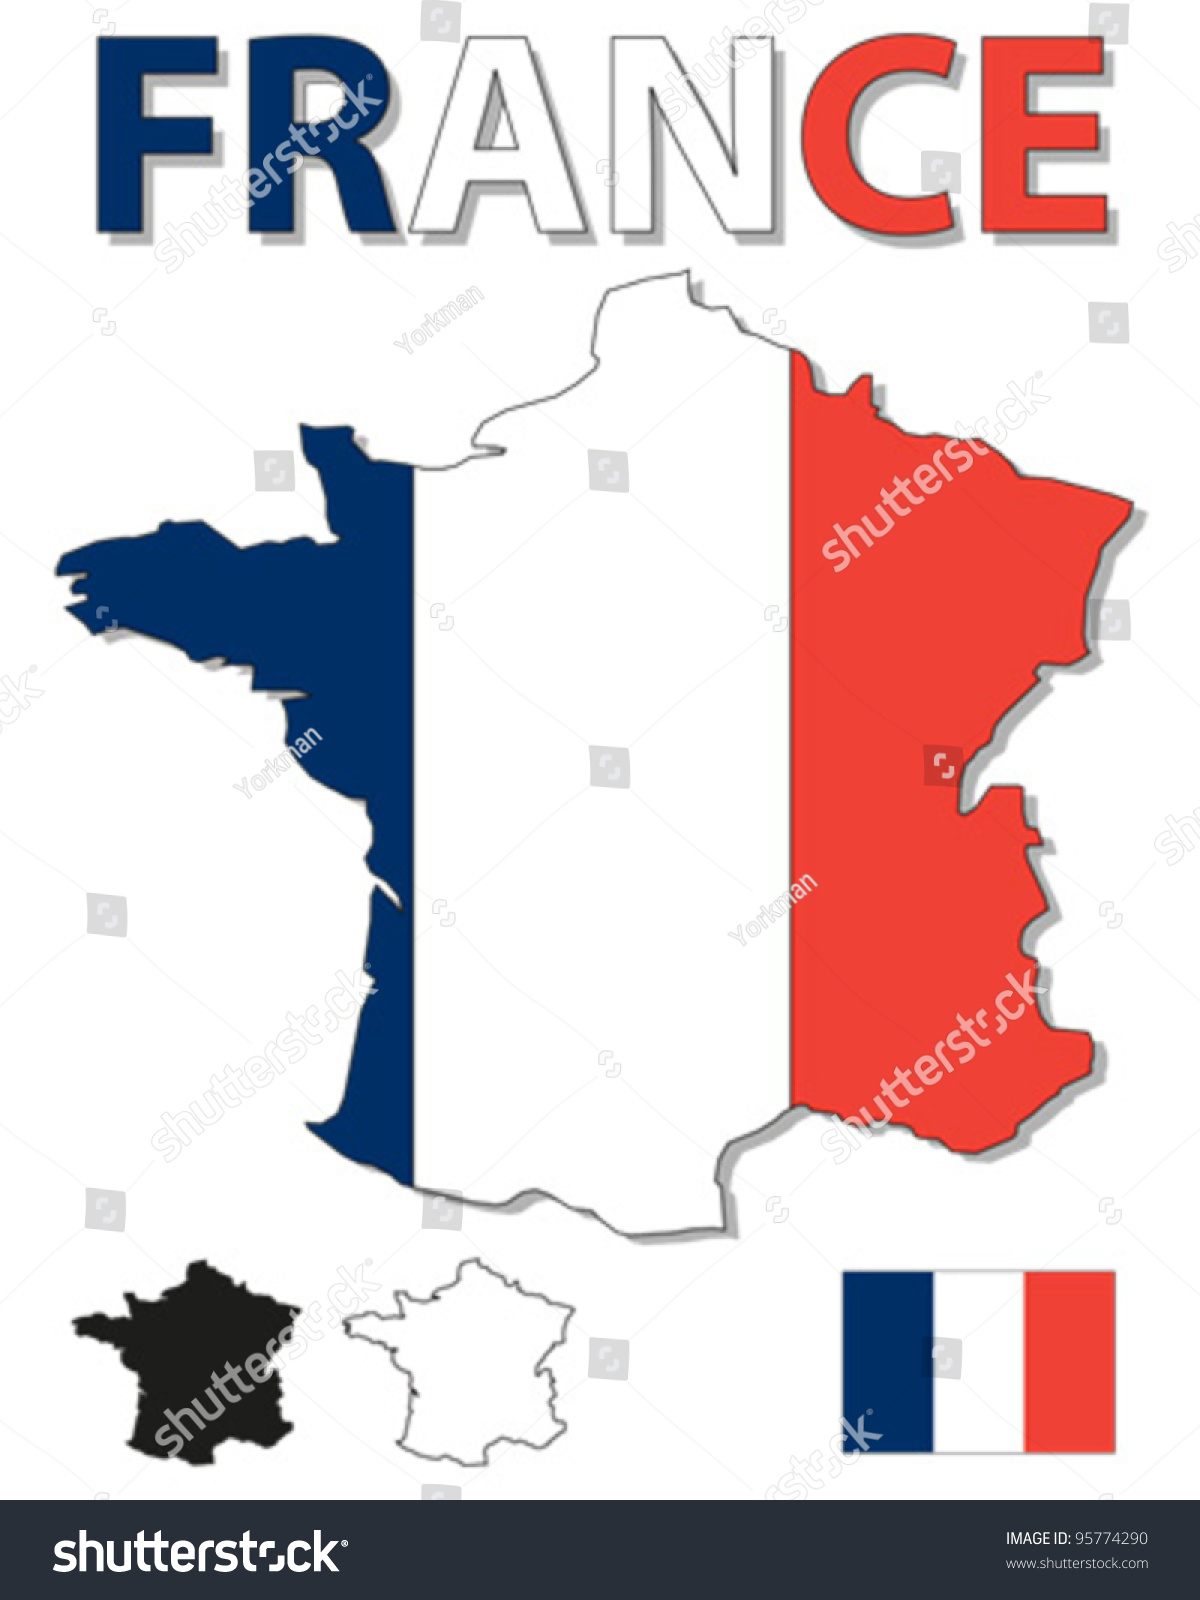 Picture of: Vector De Stock Libre De Regalias Sobre Outline Map France Filled French Flag95774290